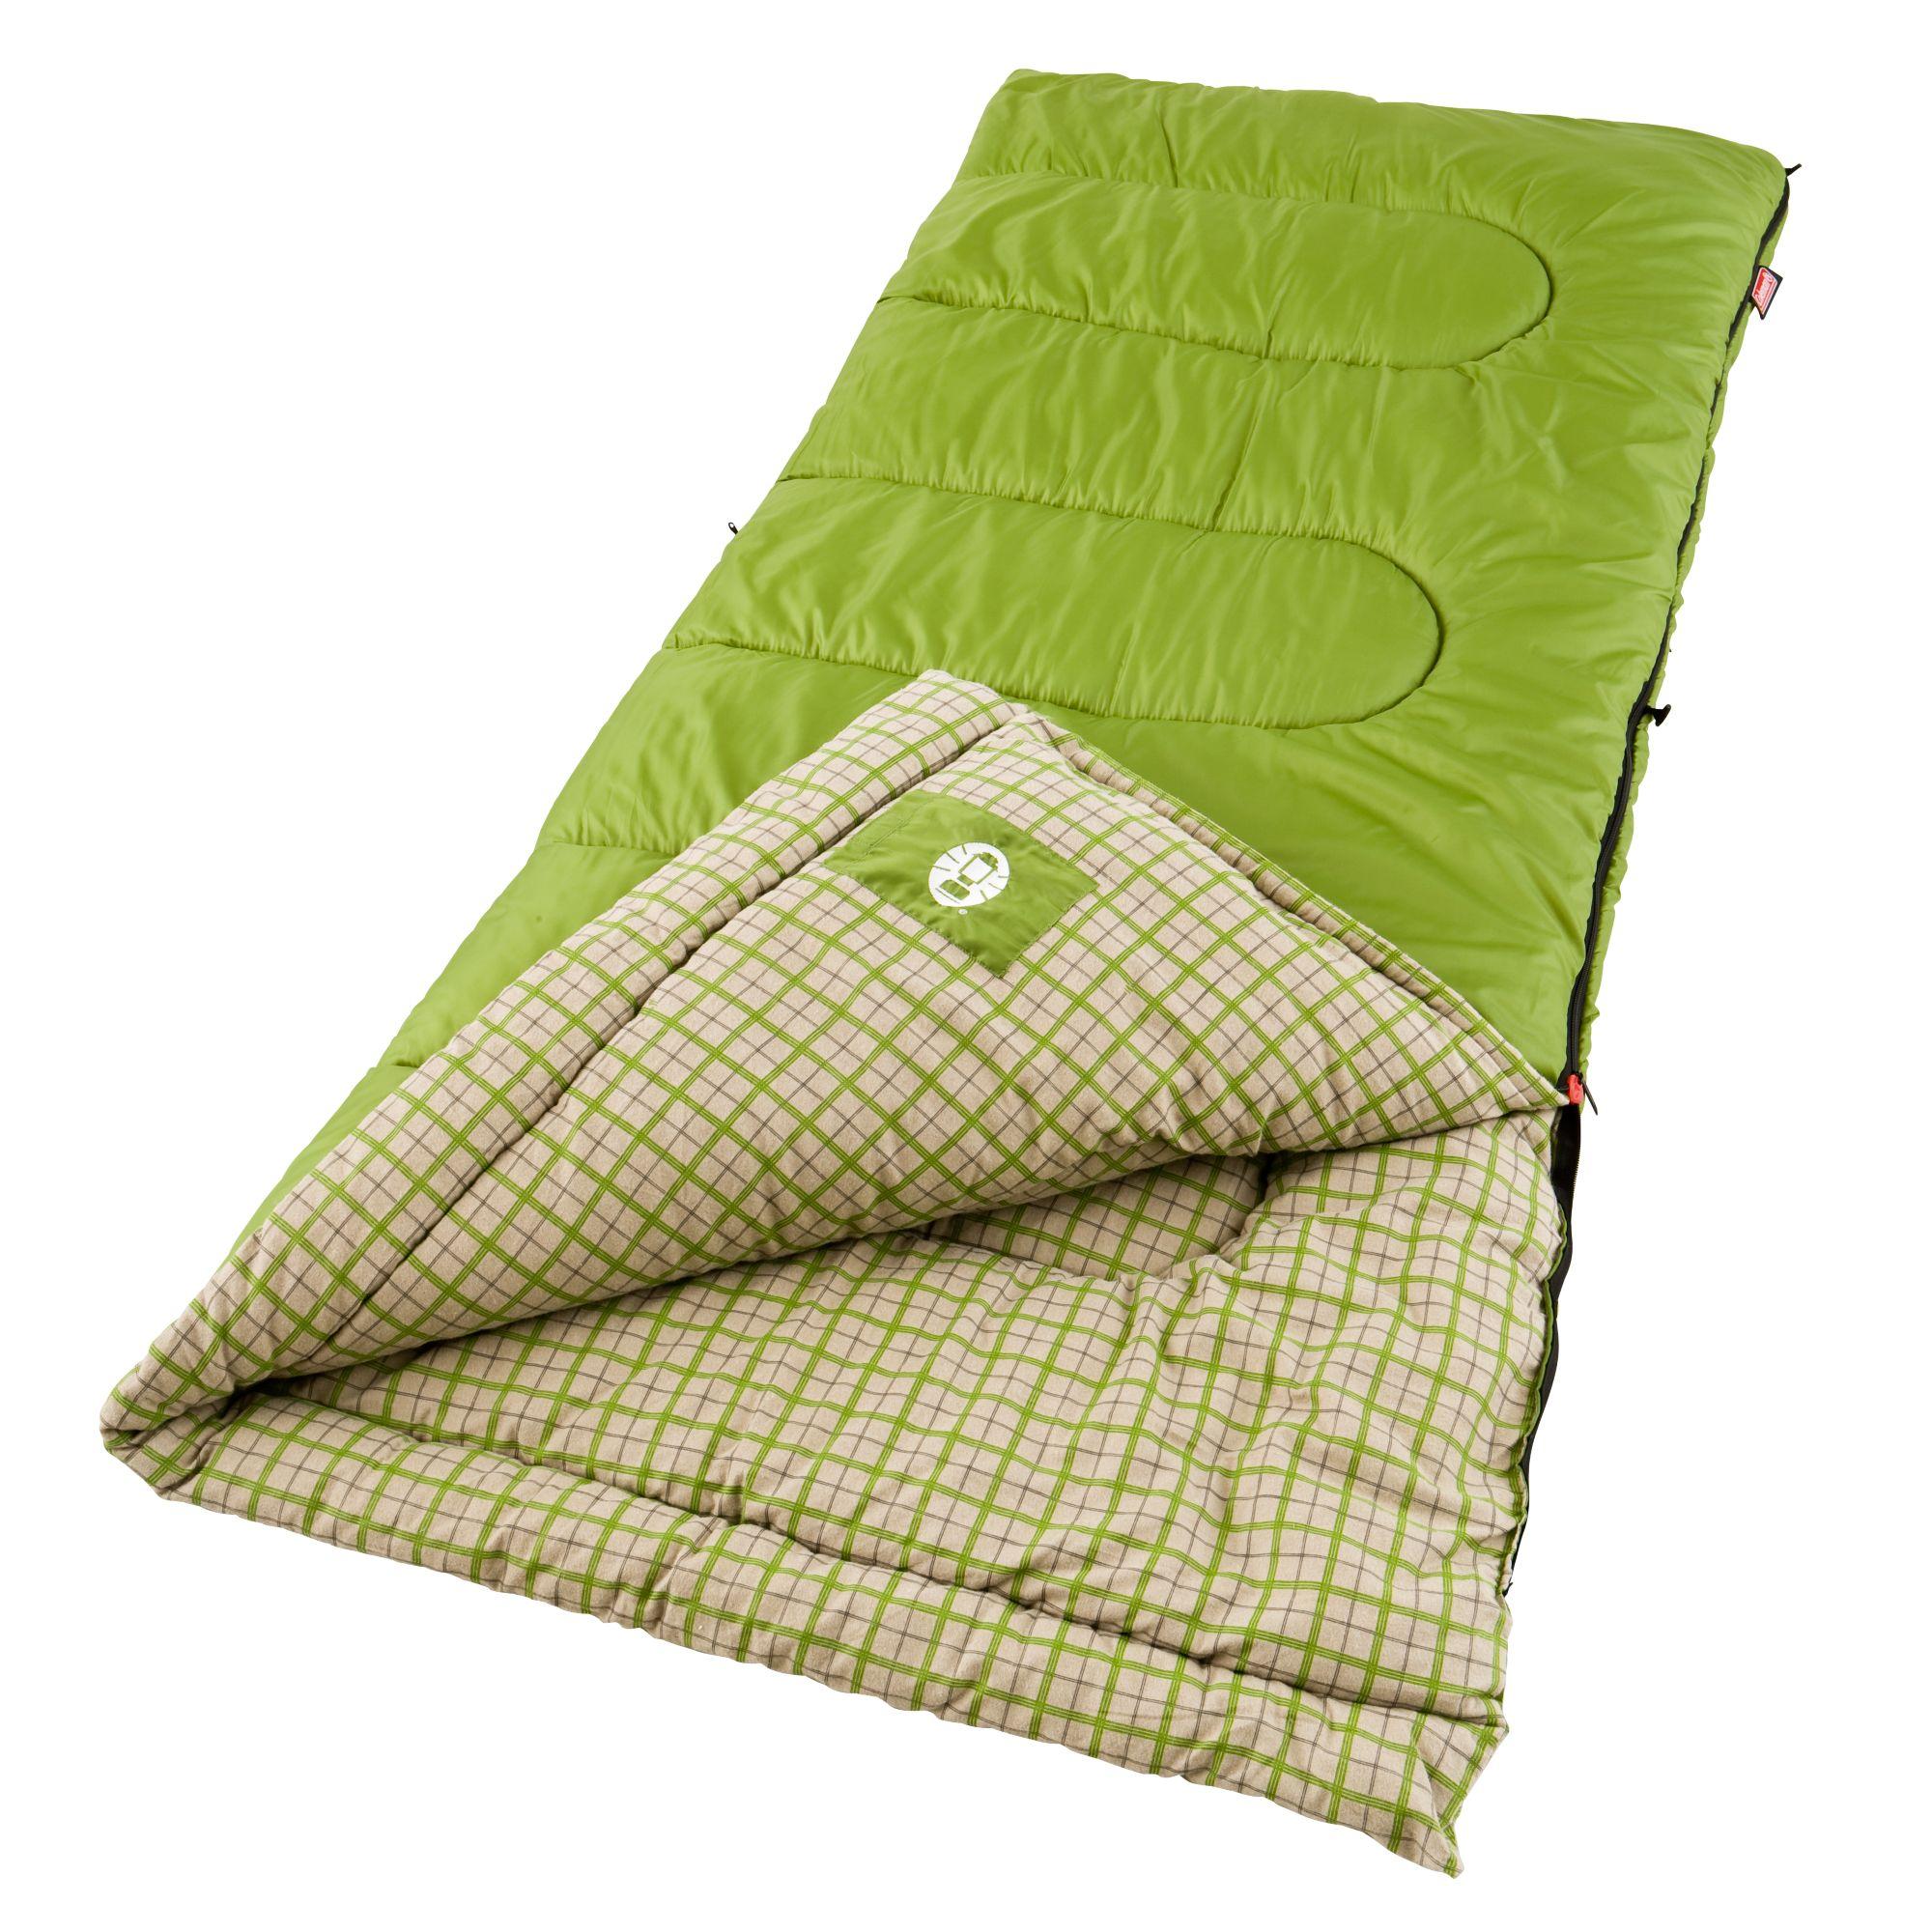 Green Valley Cool Weather Sleeping Bag Coleman